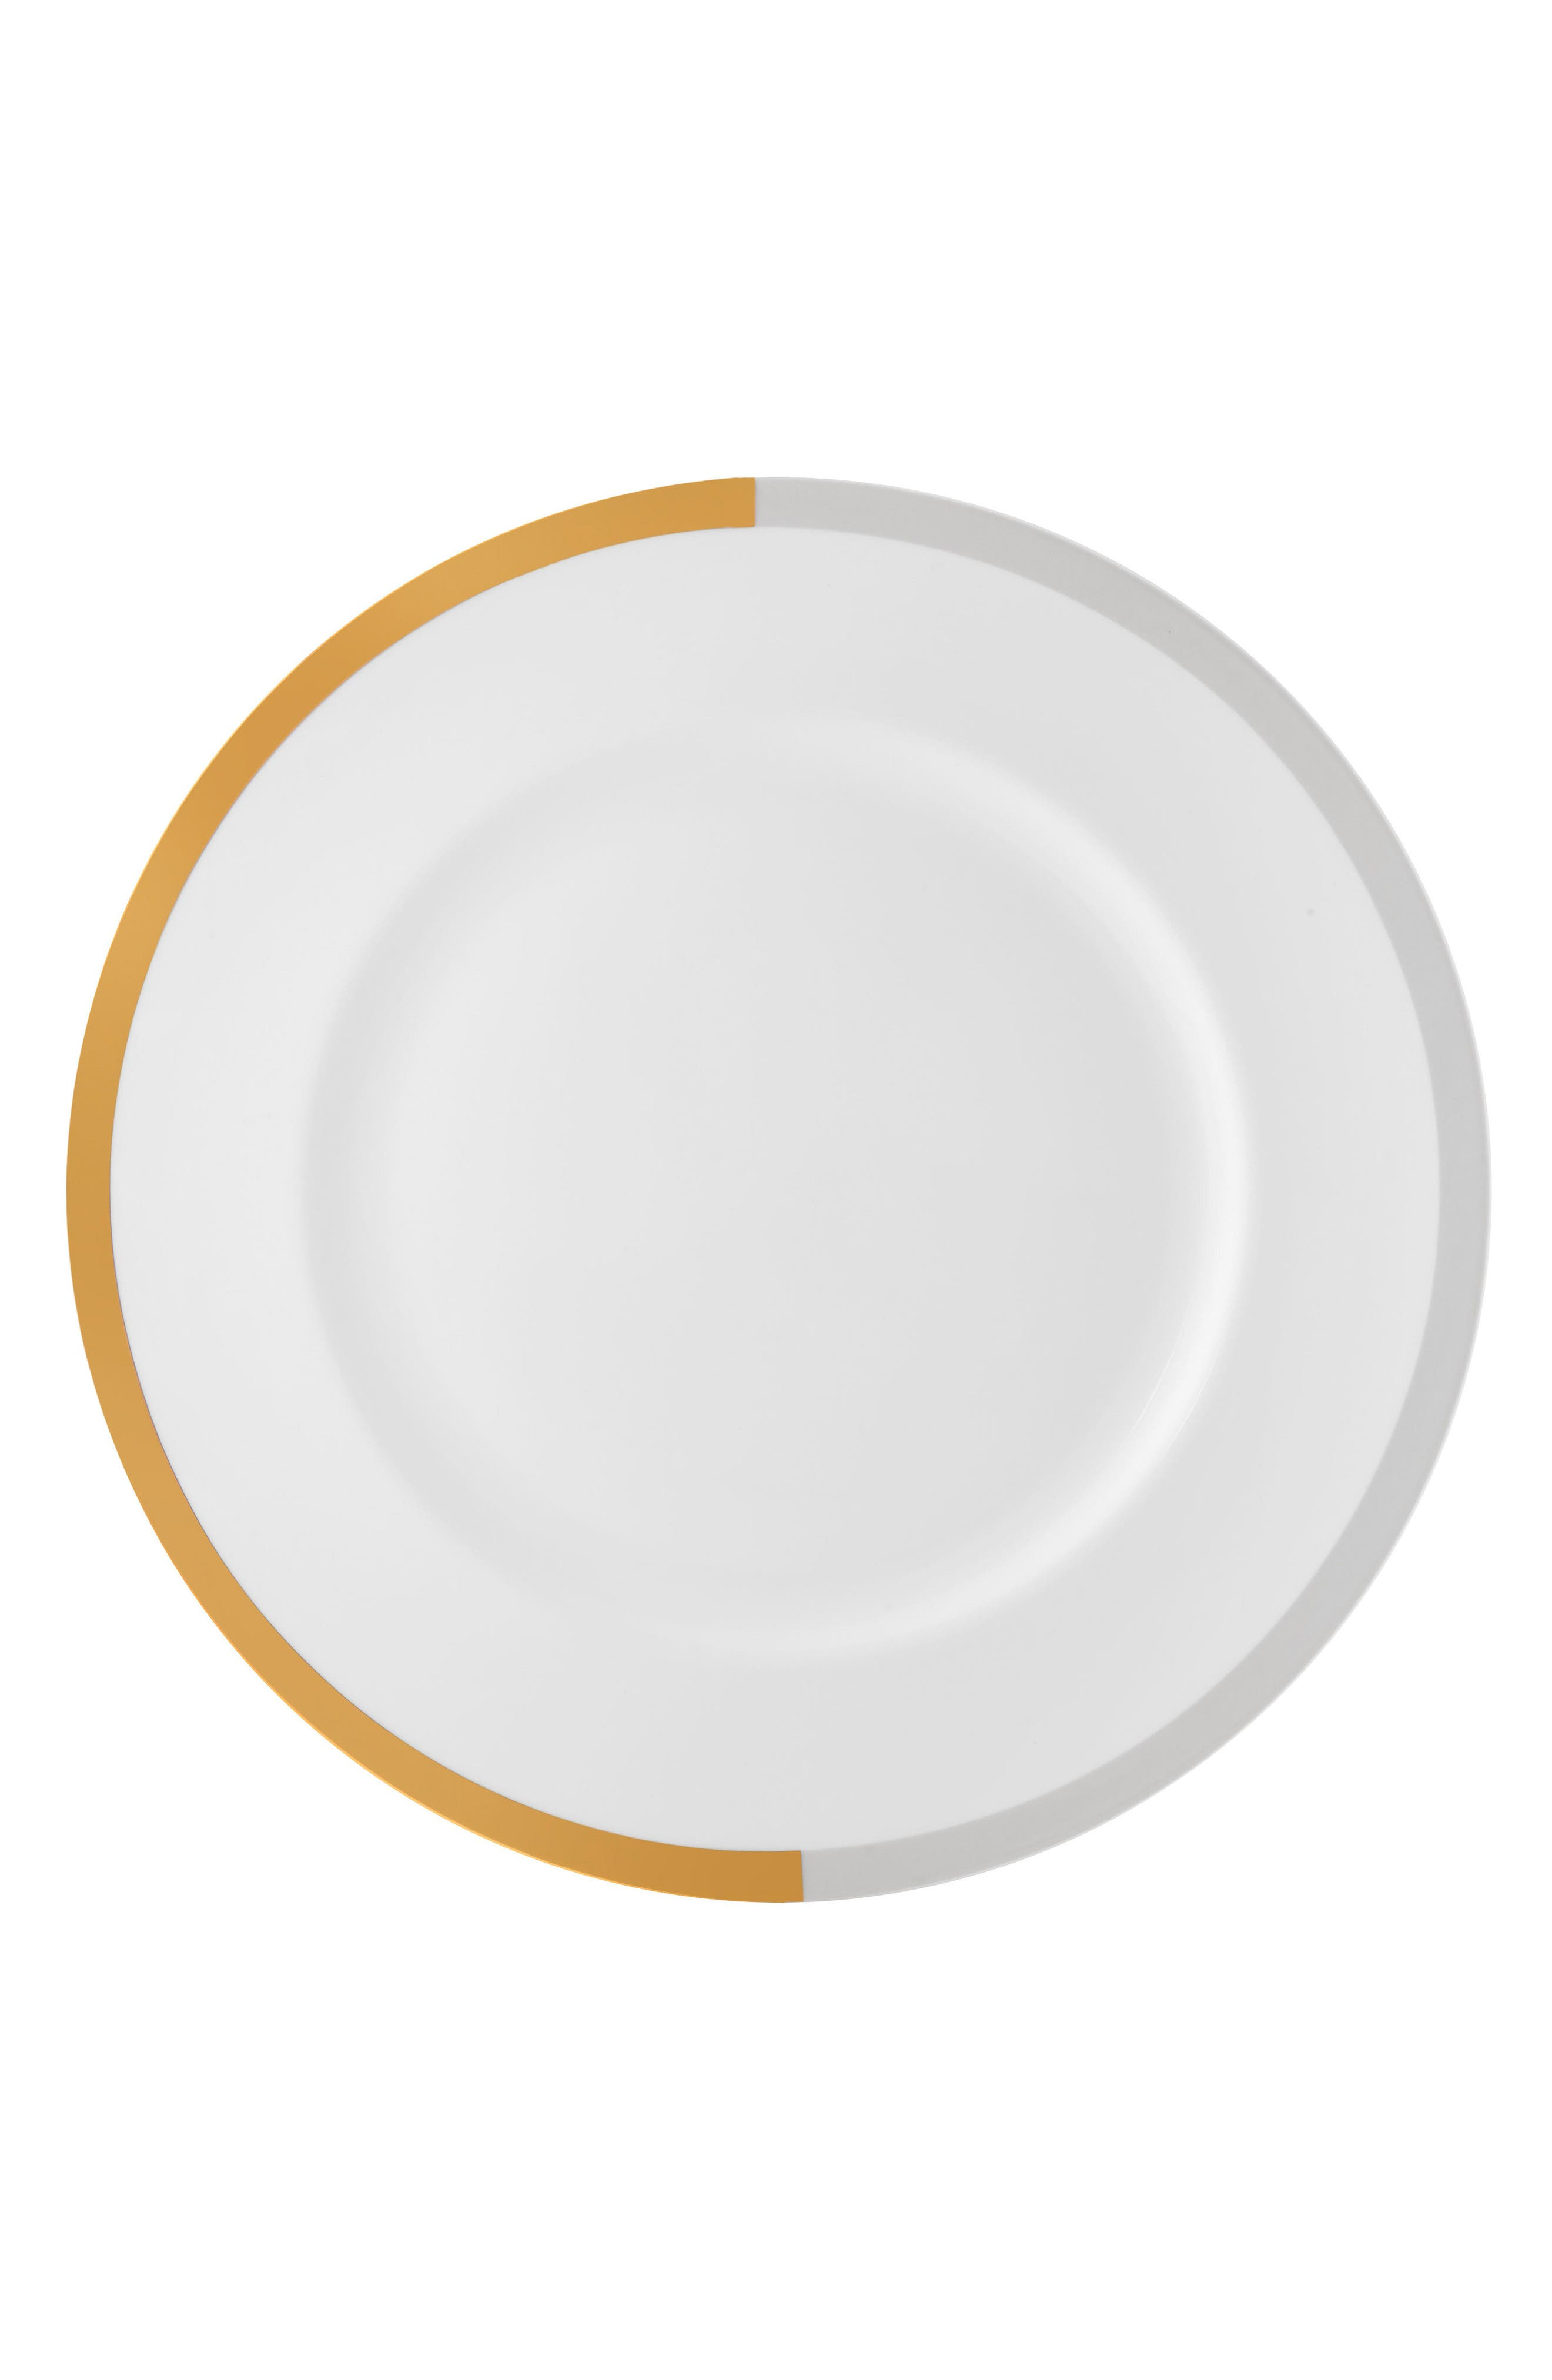 Vera Wang x Wedgwood Castillon Dinner Plate